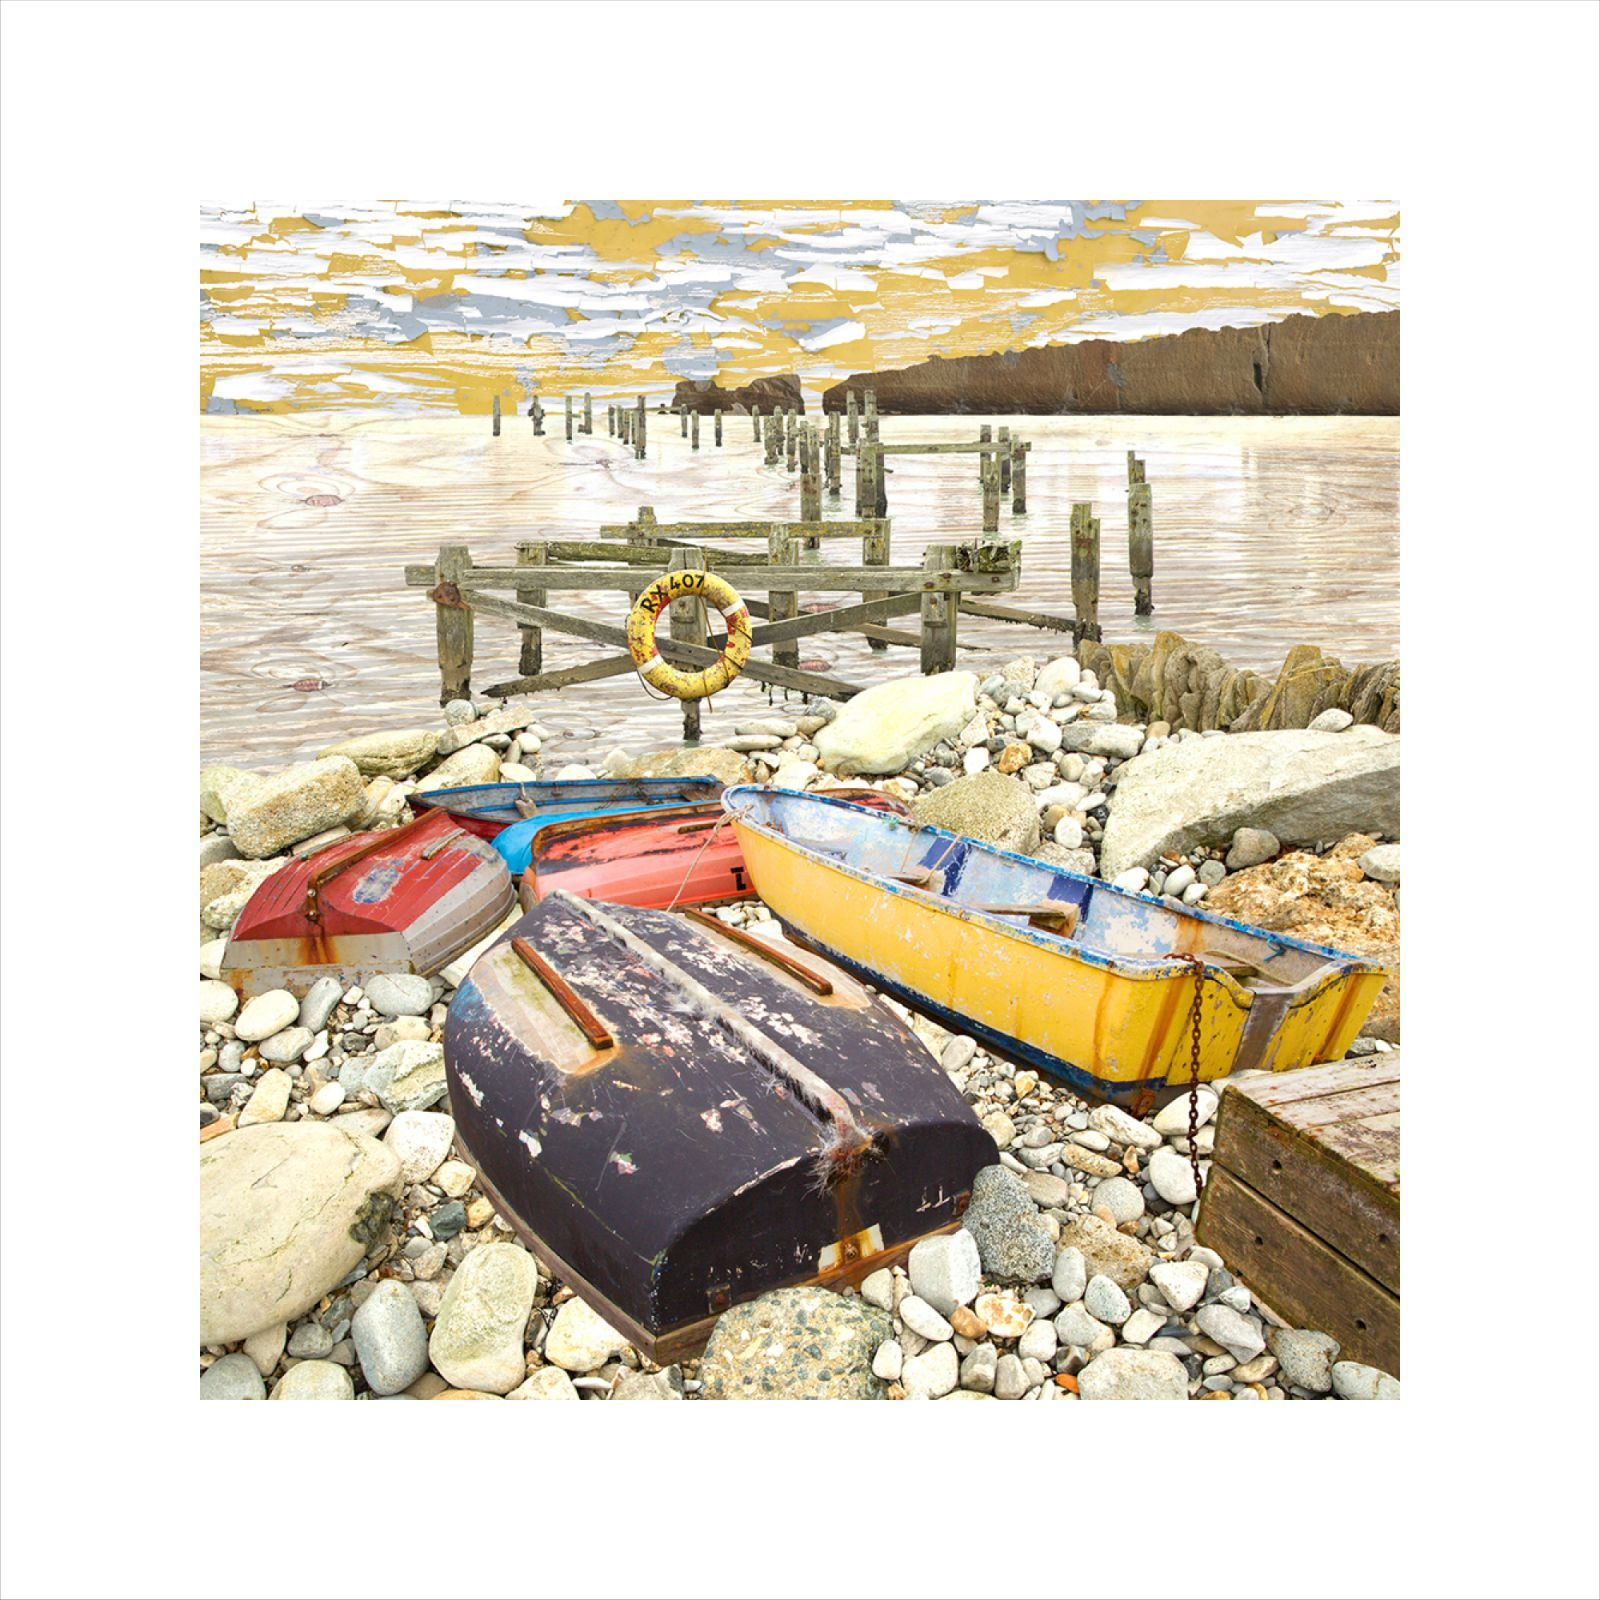 affordable art, art for sale. art online, art prints, Claire Gill, Limited edition prints, digital photomontage, fine art prints, hahnemuhle, coastal art, Collect Art, seascape 52, Studland, Swanage, scattered